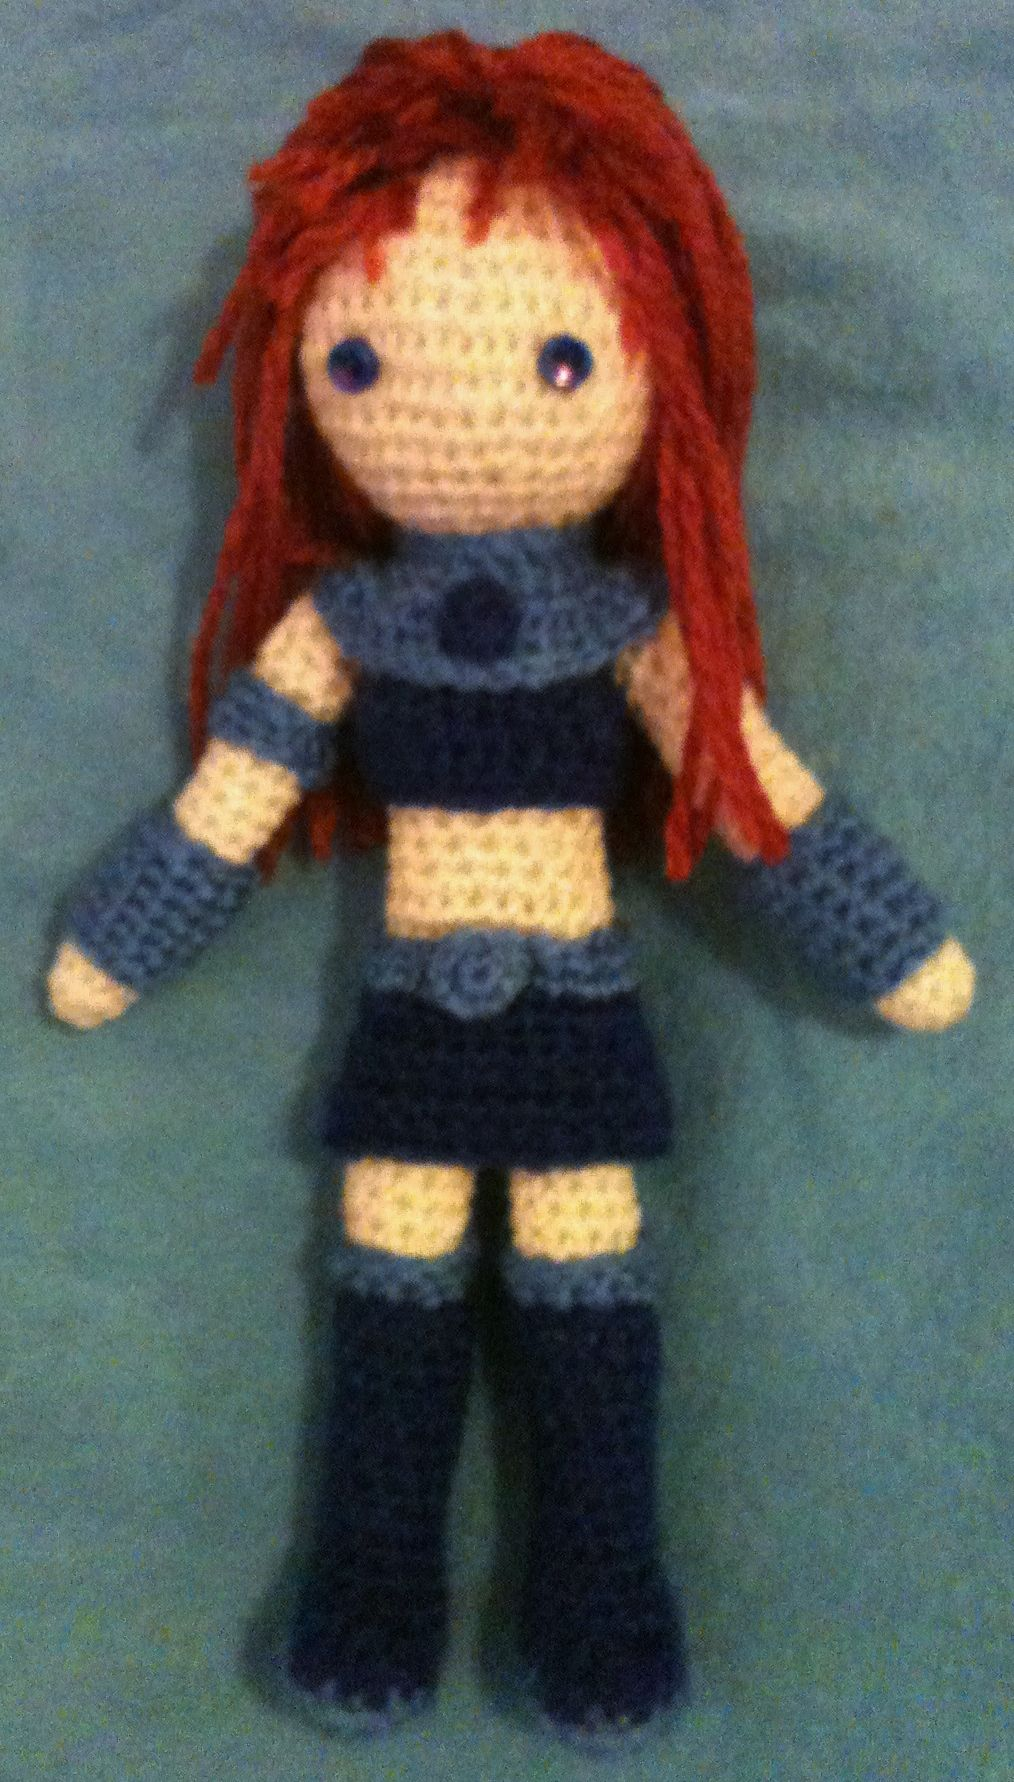 Crochet Amigurumi Ideas : Starfire, from